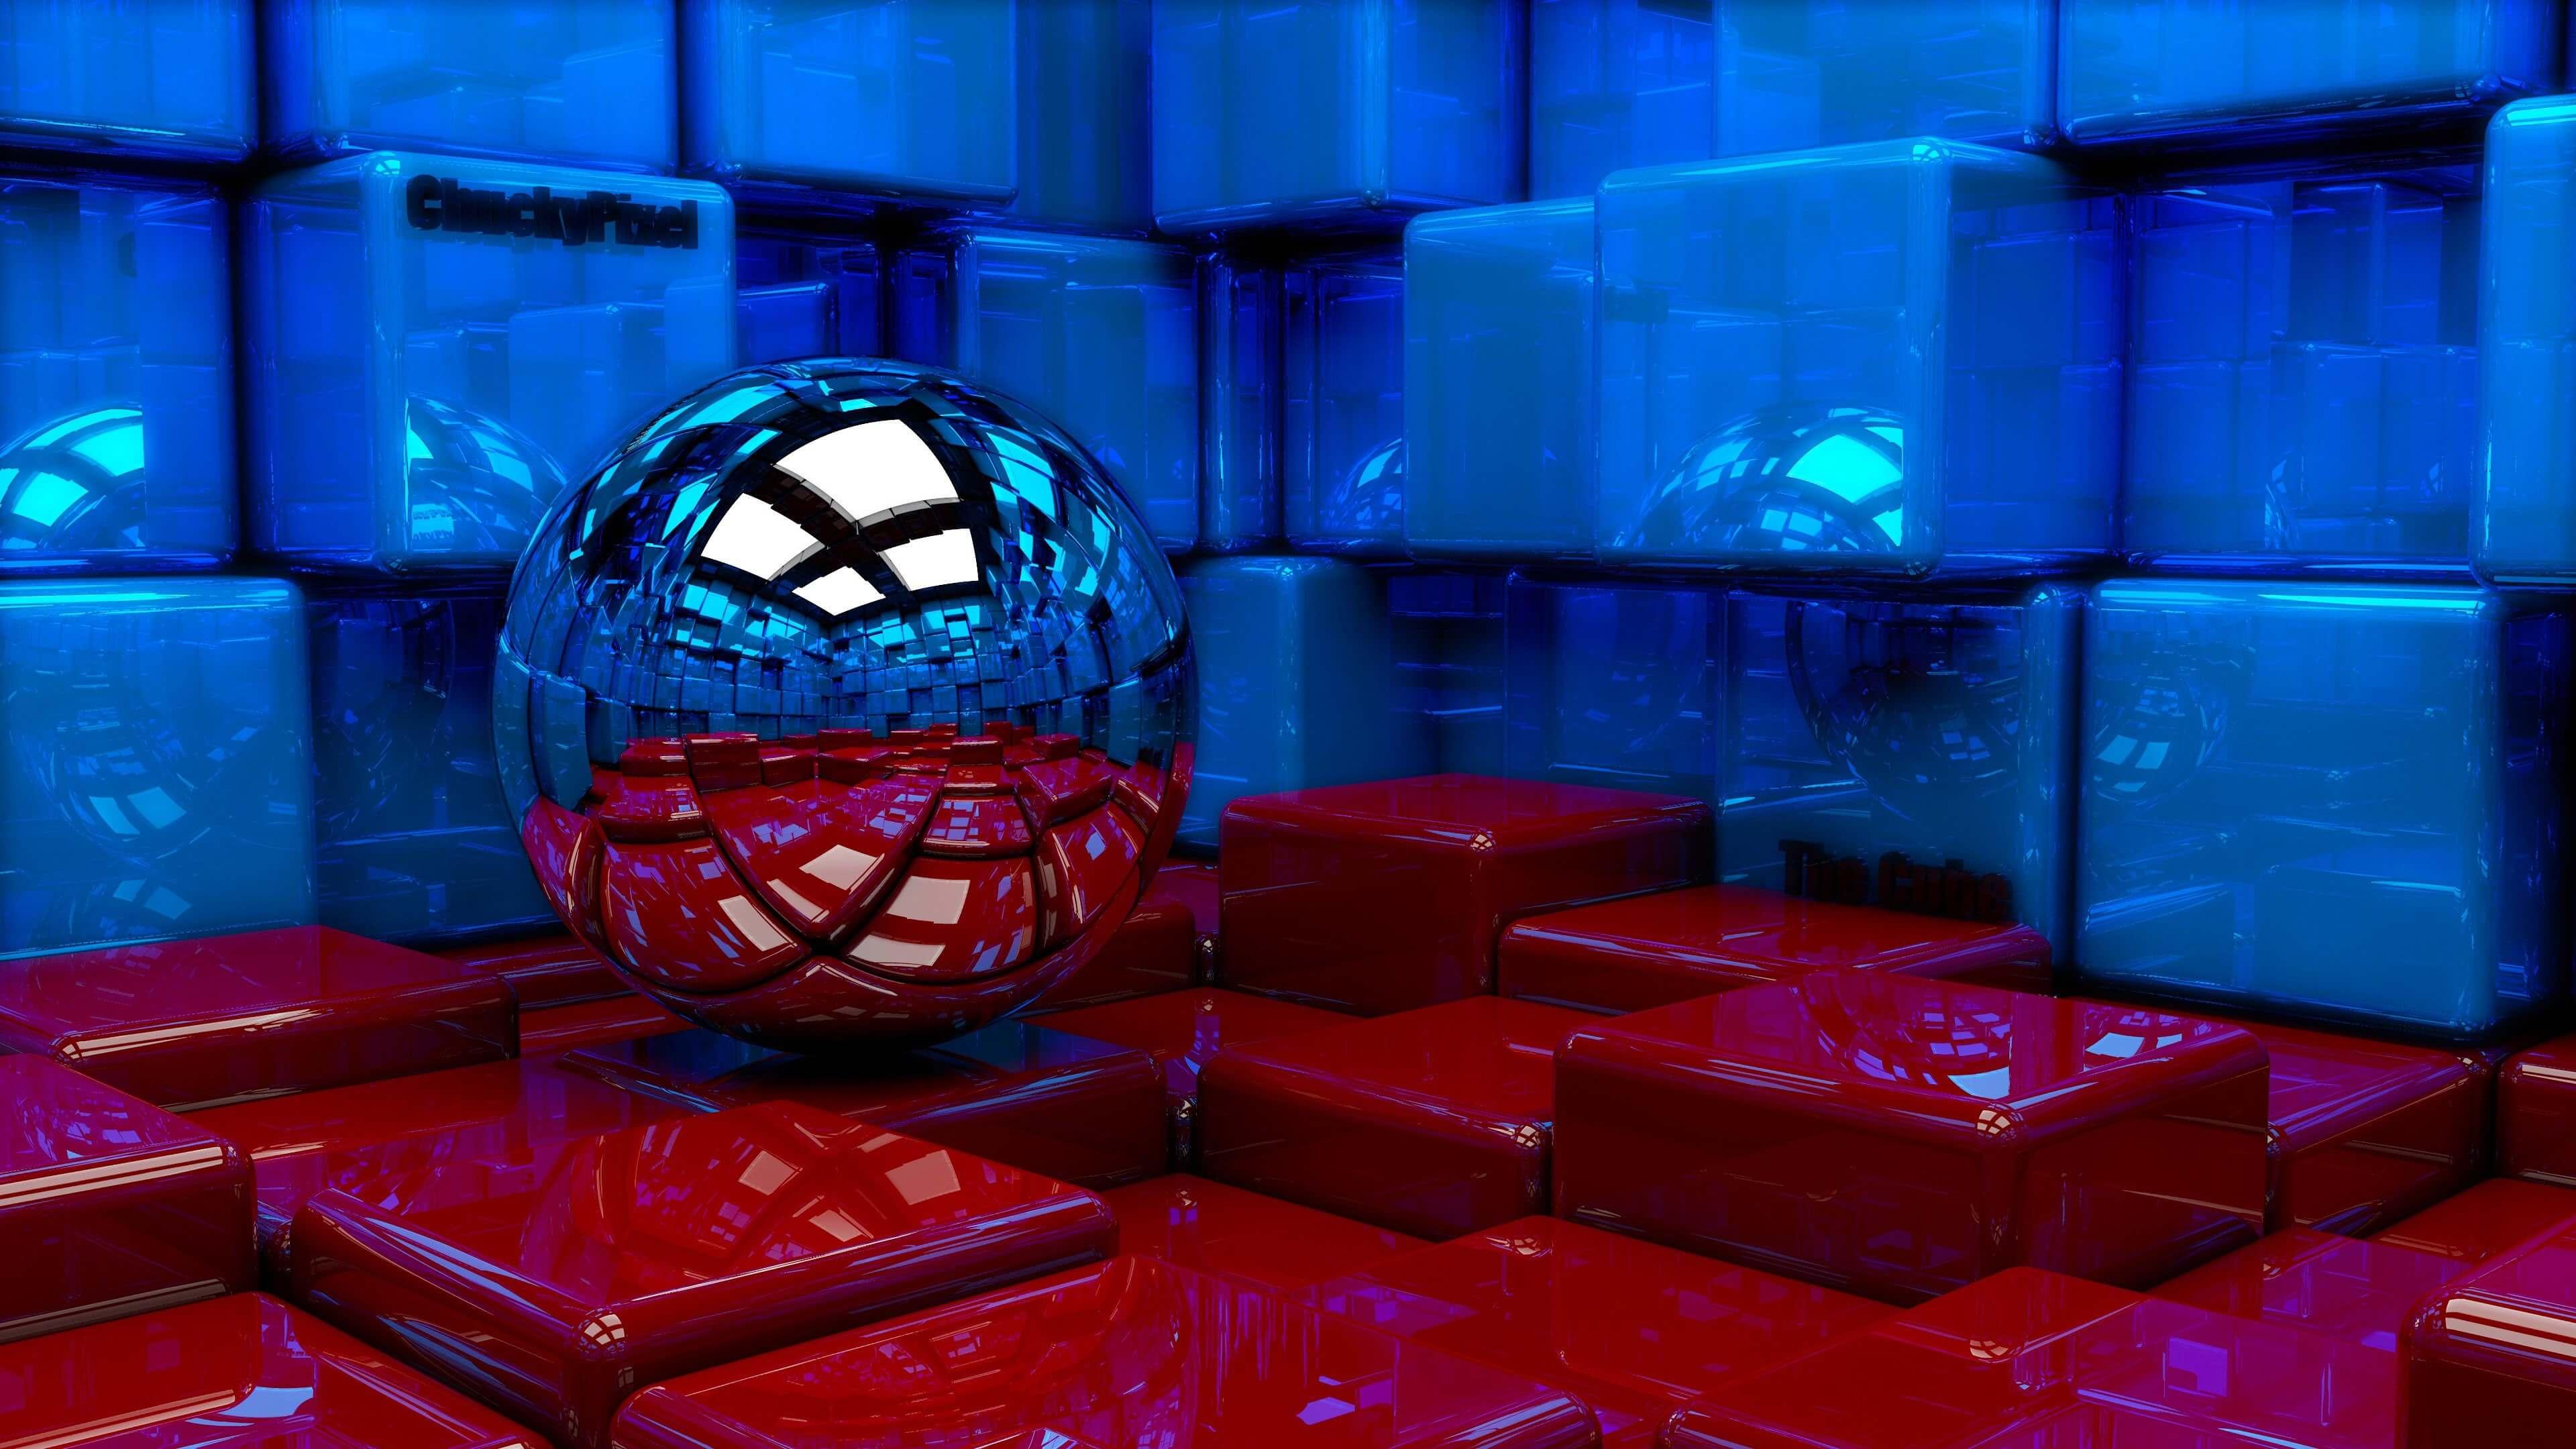 3d Cube Wallpaper Phone Metallic Sphere Reflecting The Cube Room 4k Wallpaper